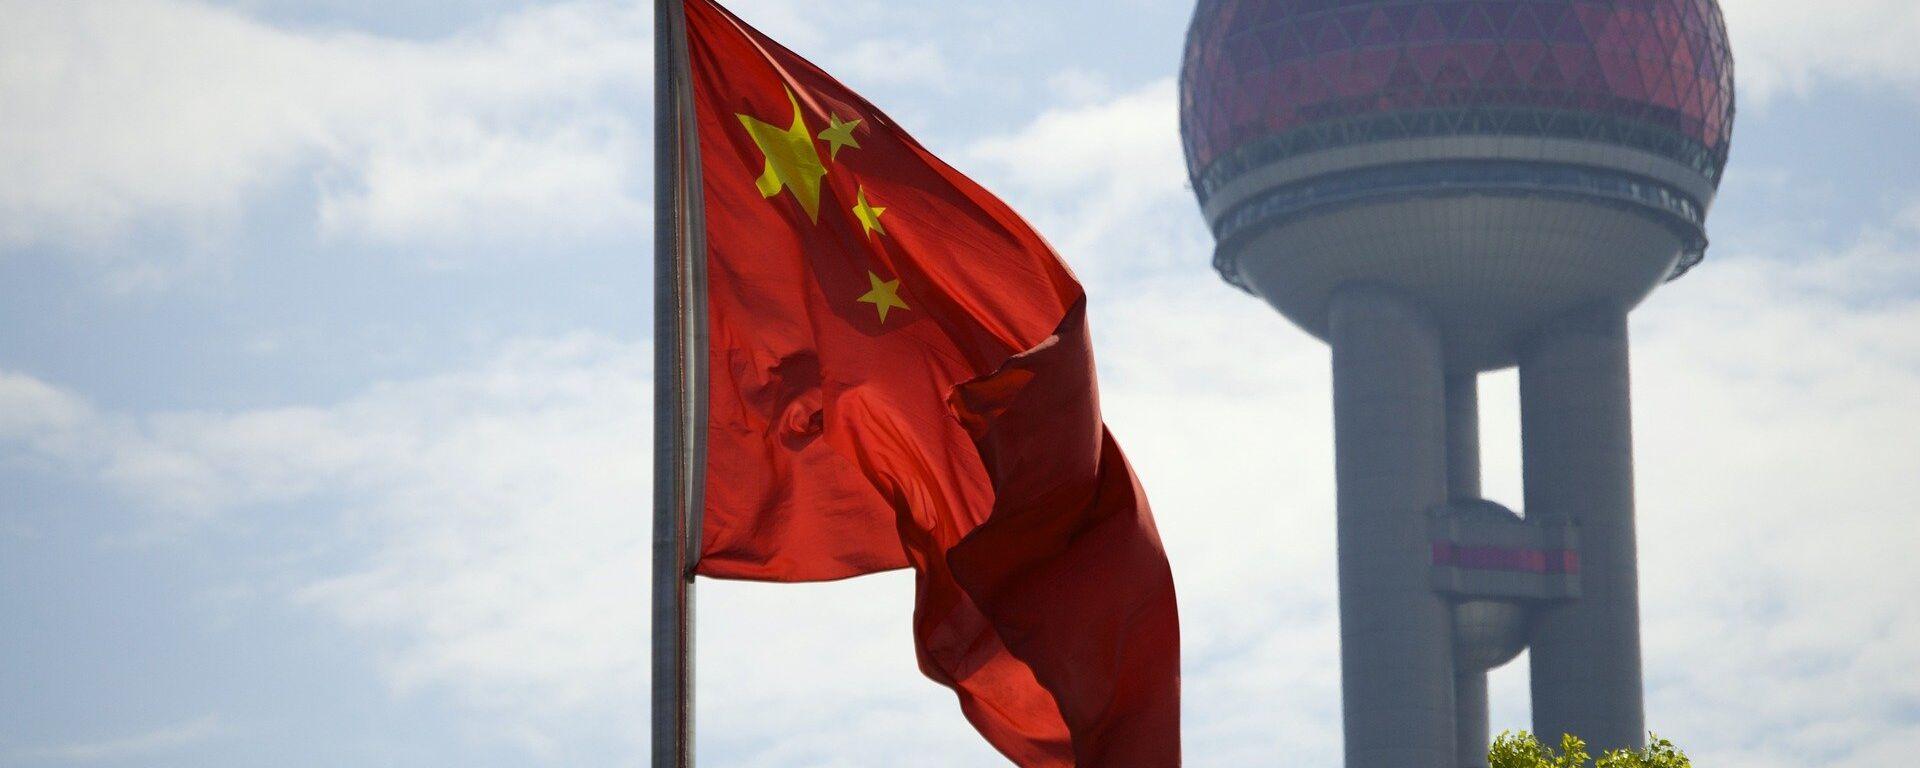 Bandera de China - Sputnik Mundo, 1920, 18.08.2021